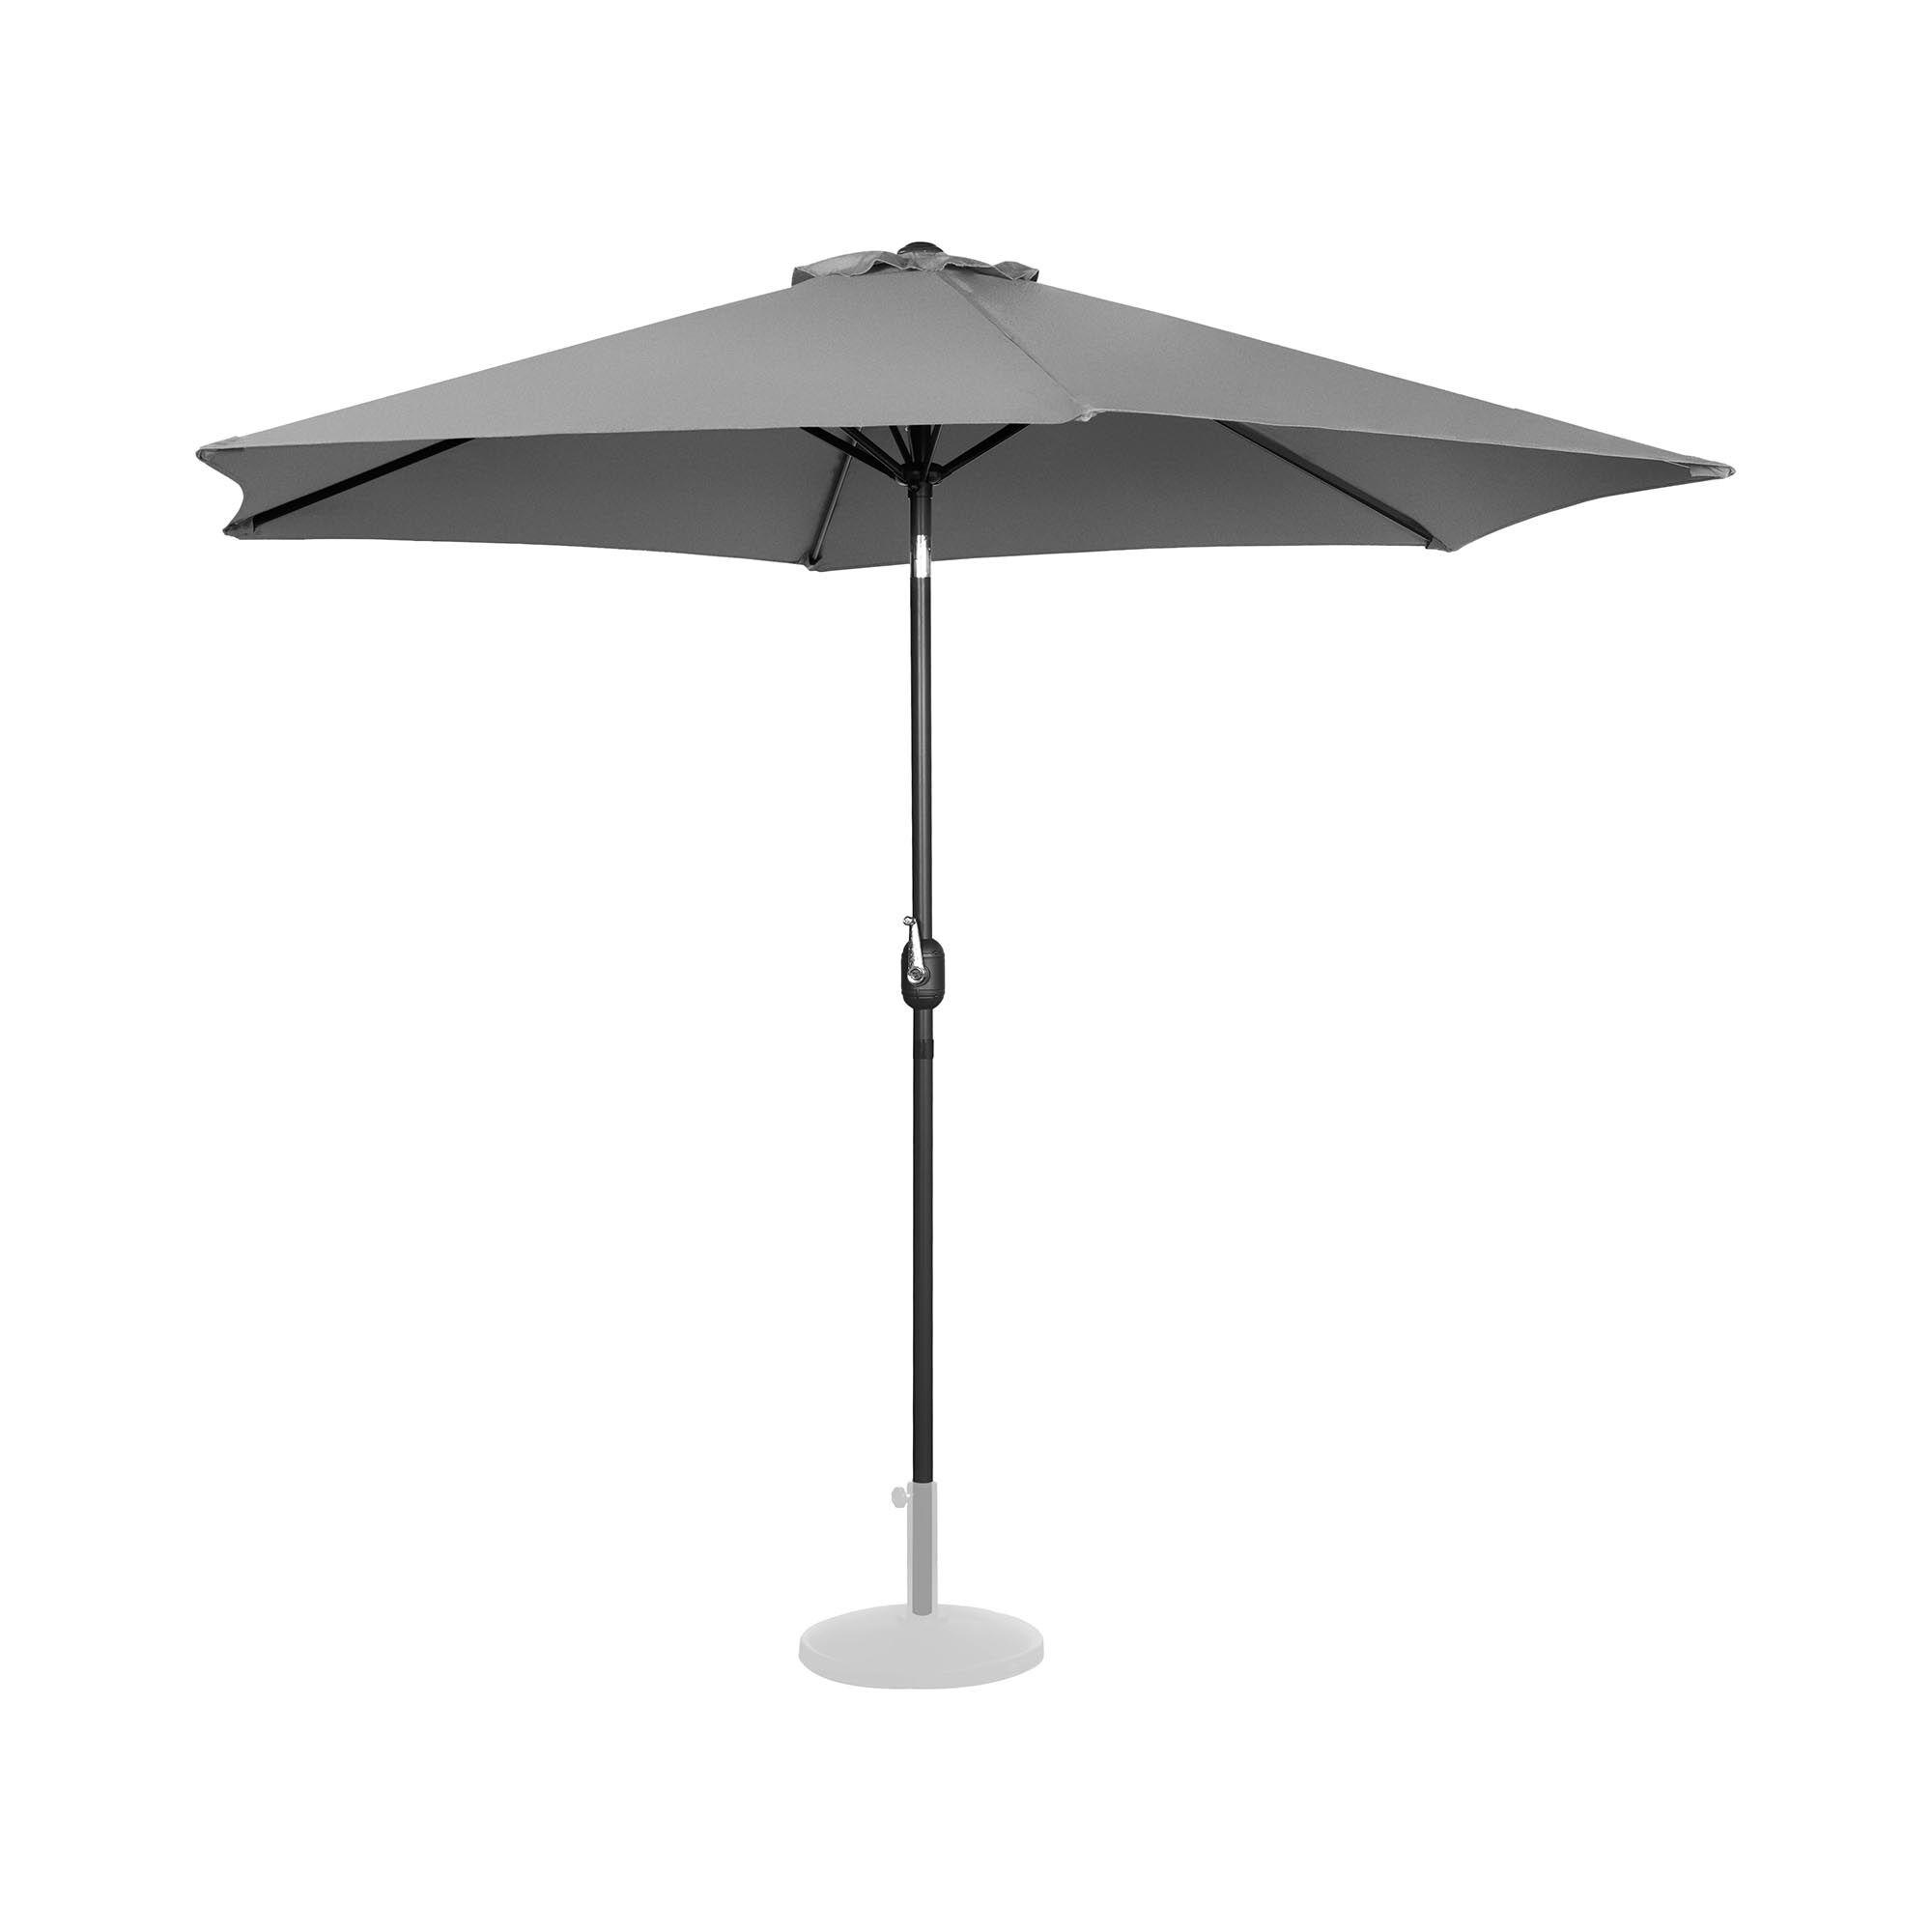 Uniprodo Parasol - mørkegrå - sekskantet - 300 cm i diameter - knæk-position UNI_UMBRELLA_TR300DG